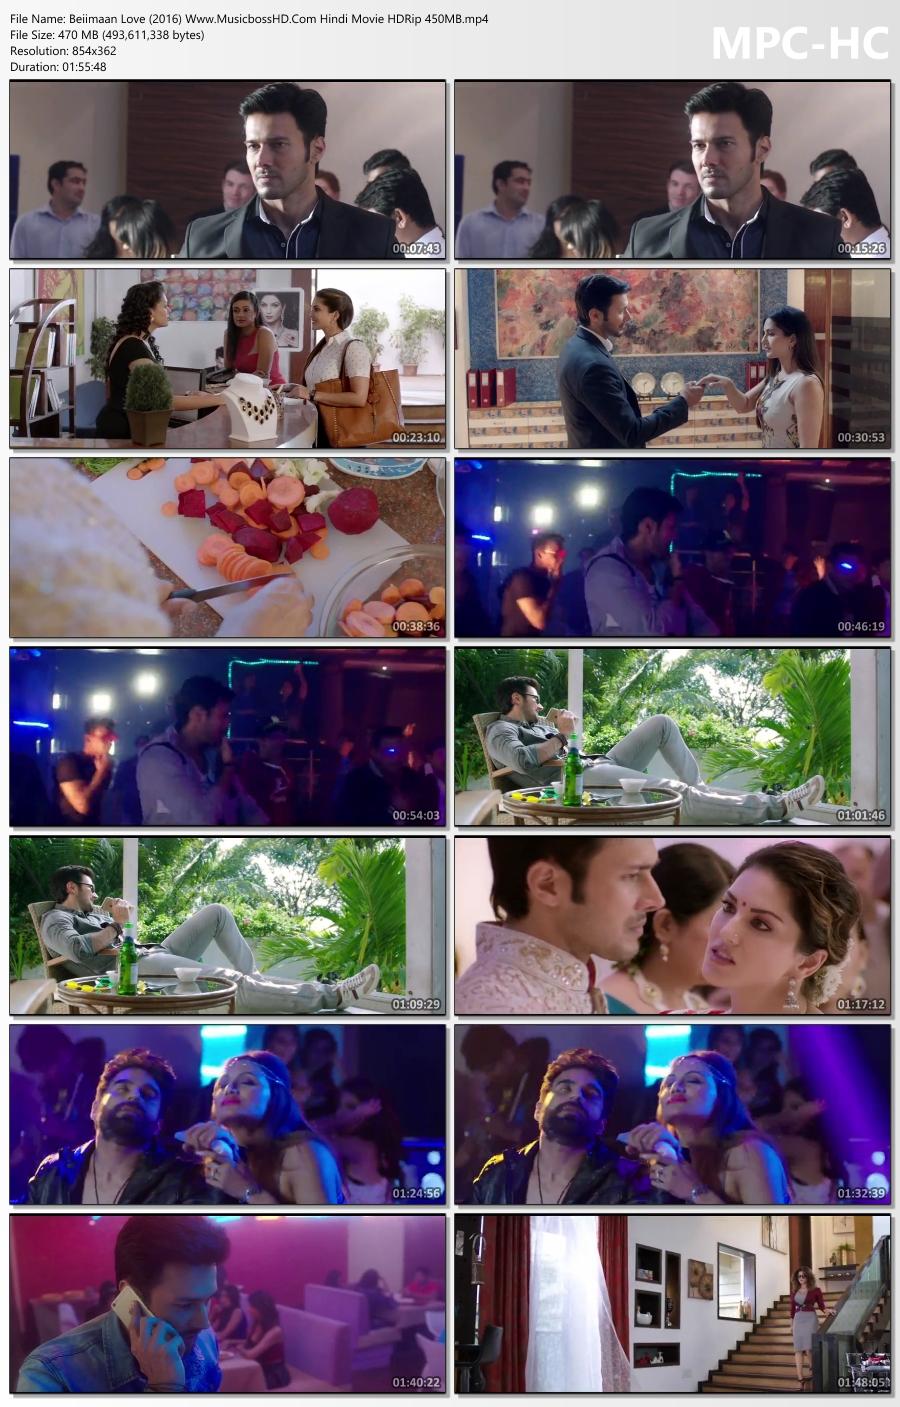 Beiimaan-Love-2016-Www-Musicboss-HD-Com-Hindi-Movie-HDRip-450-MB-mp4-thumbs